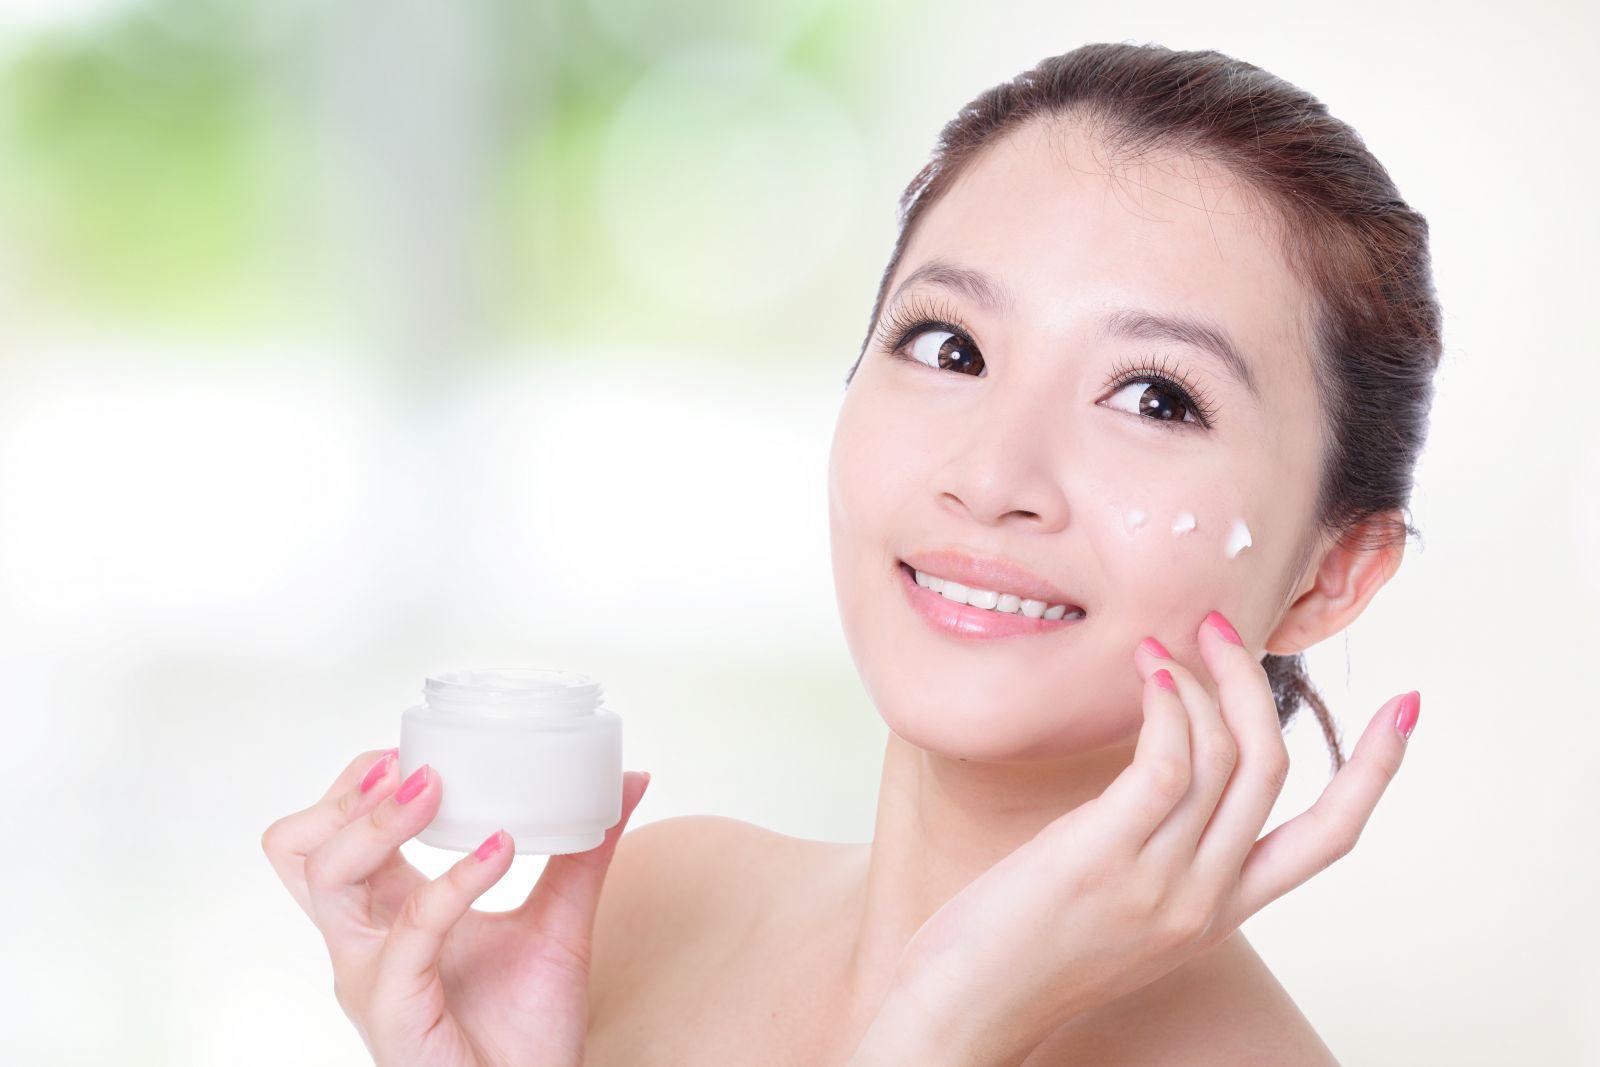 Tại sao nên sử dụng kem dưỡng da?